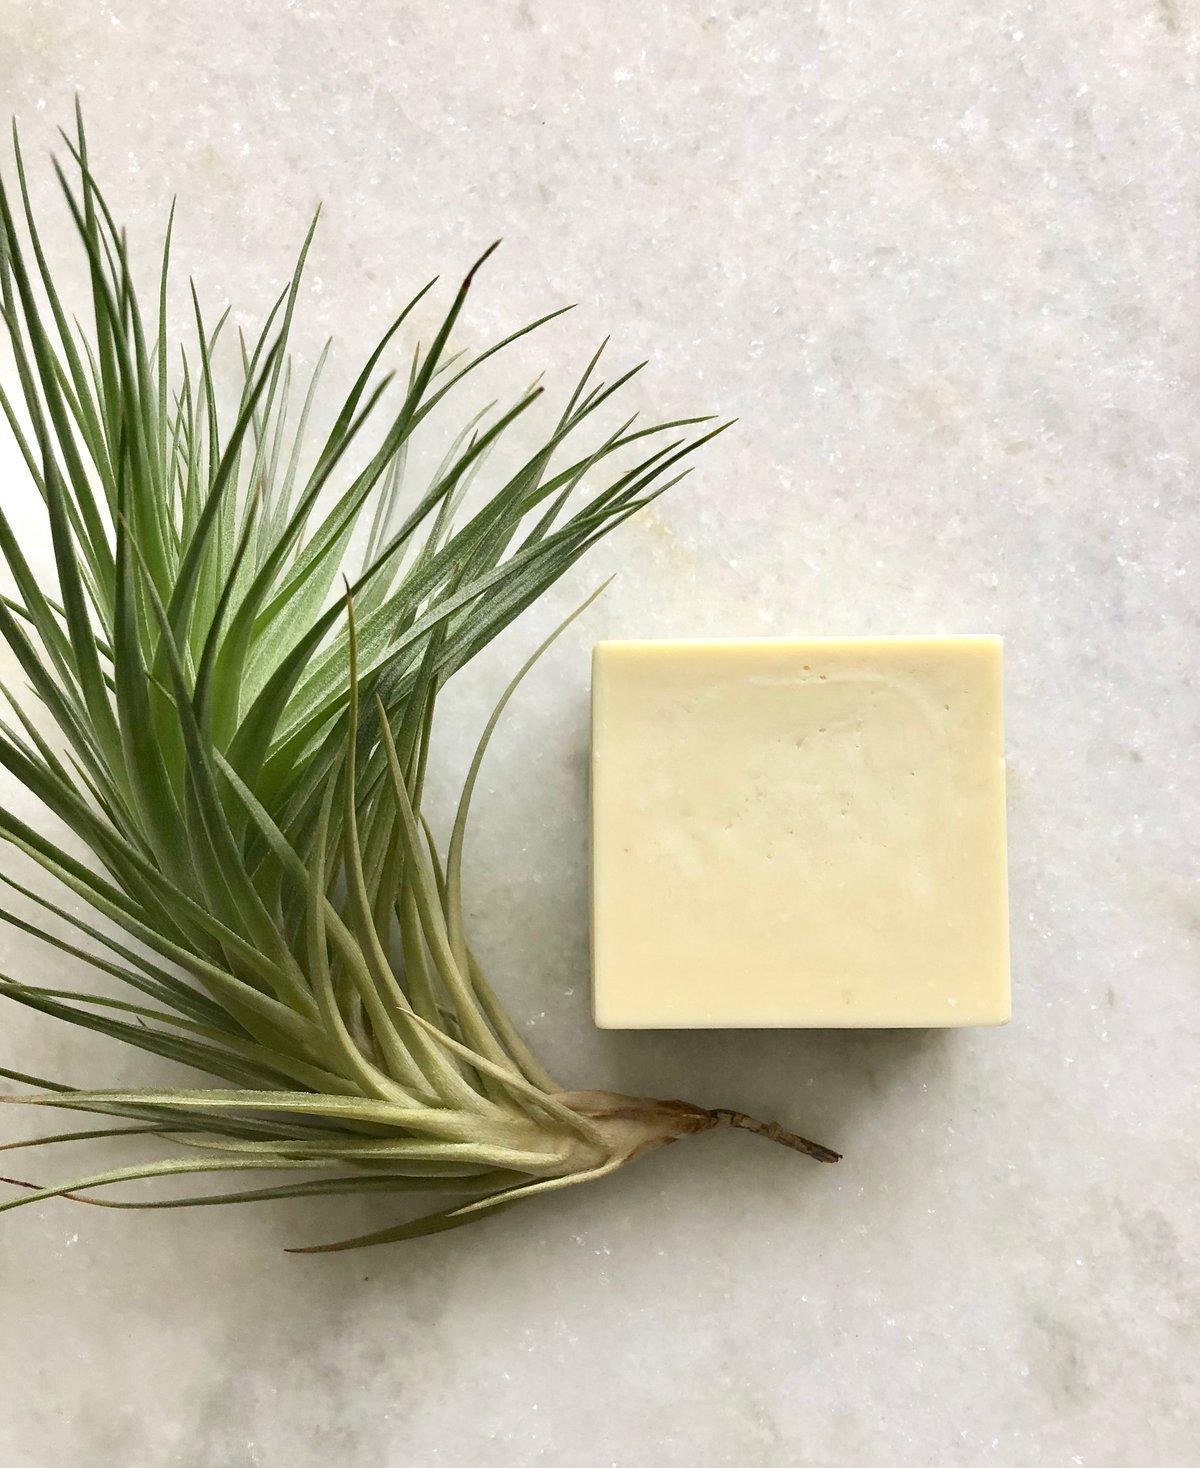 Image of Castile Soap